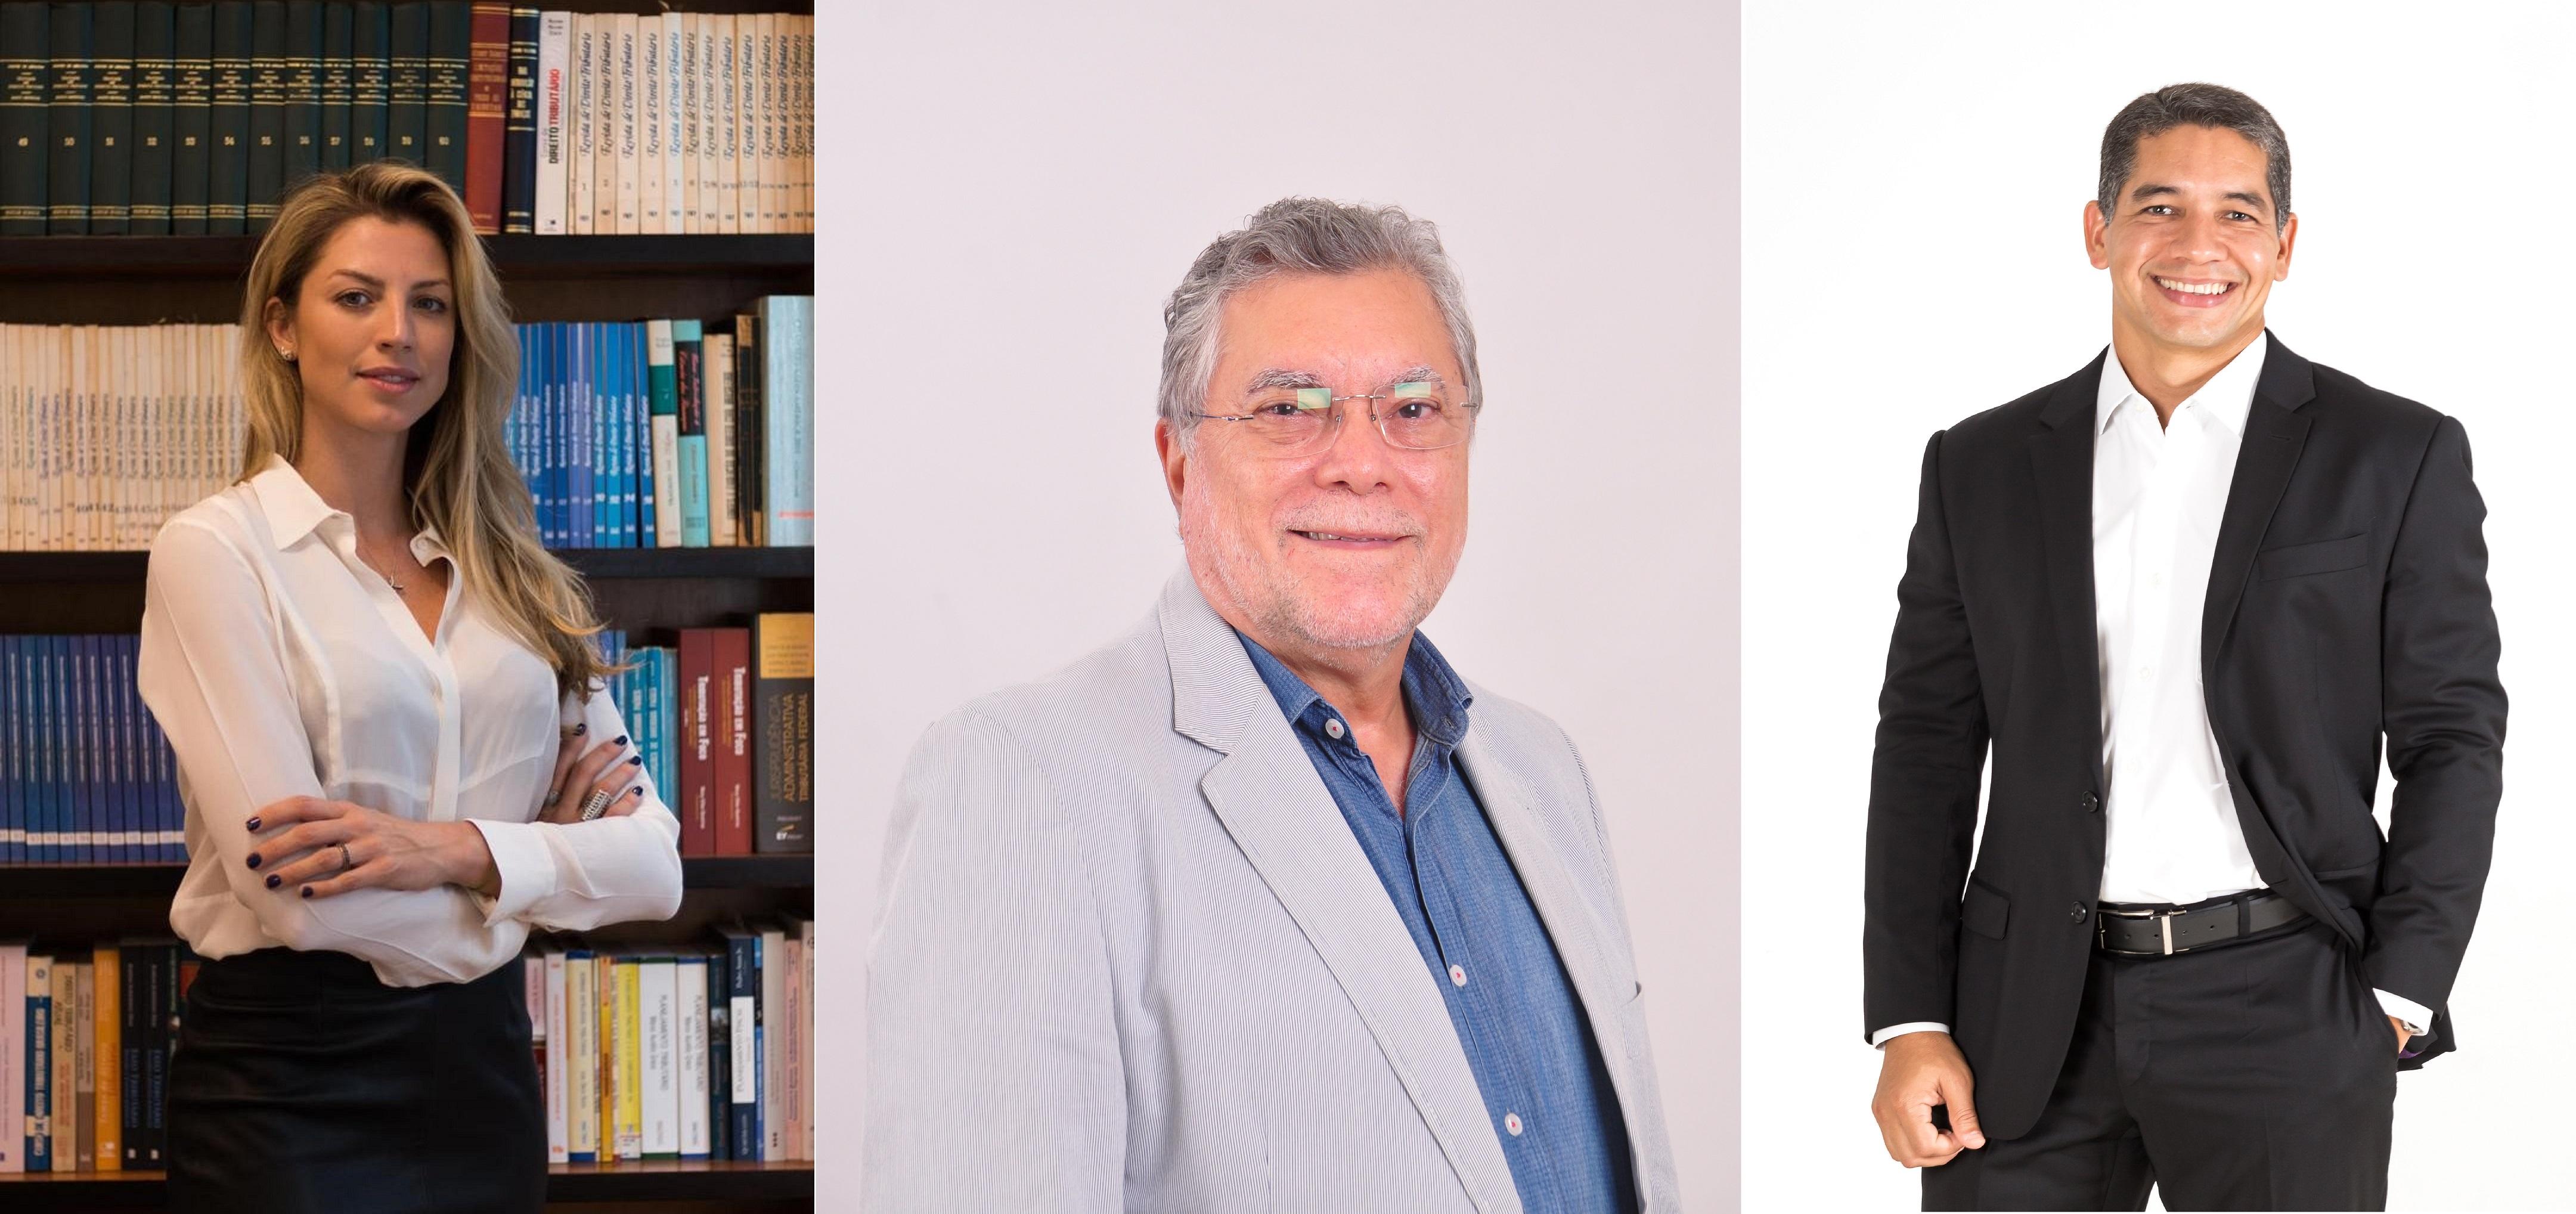 cdl-de-fortaleza-da-inicio-a-ciclo-de-estudos-sobre-a-reforma-tributaria-com-especialistas-de-renome-nacional